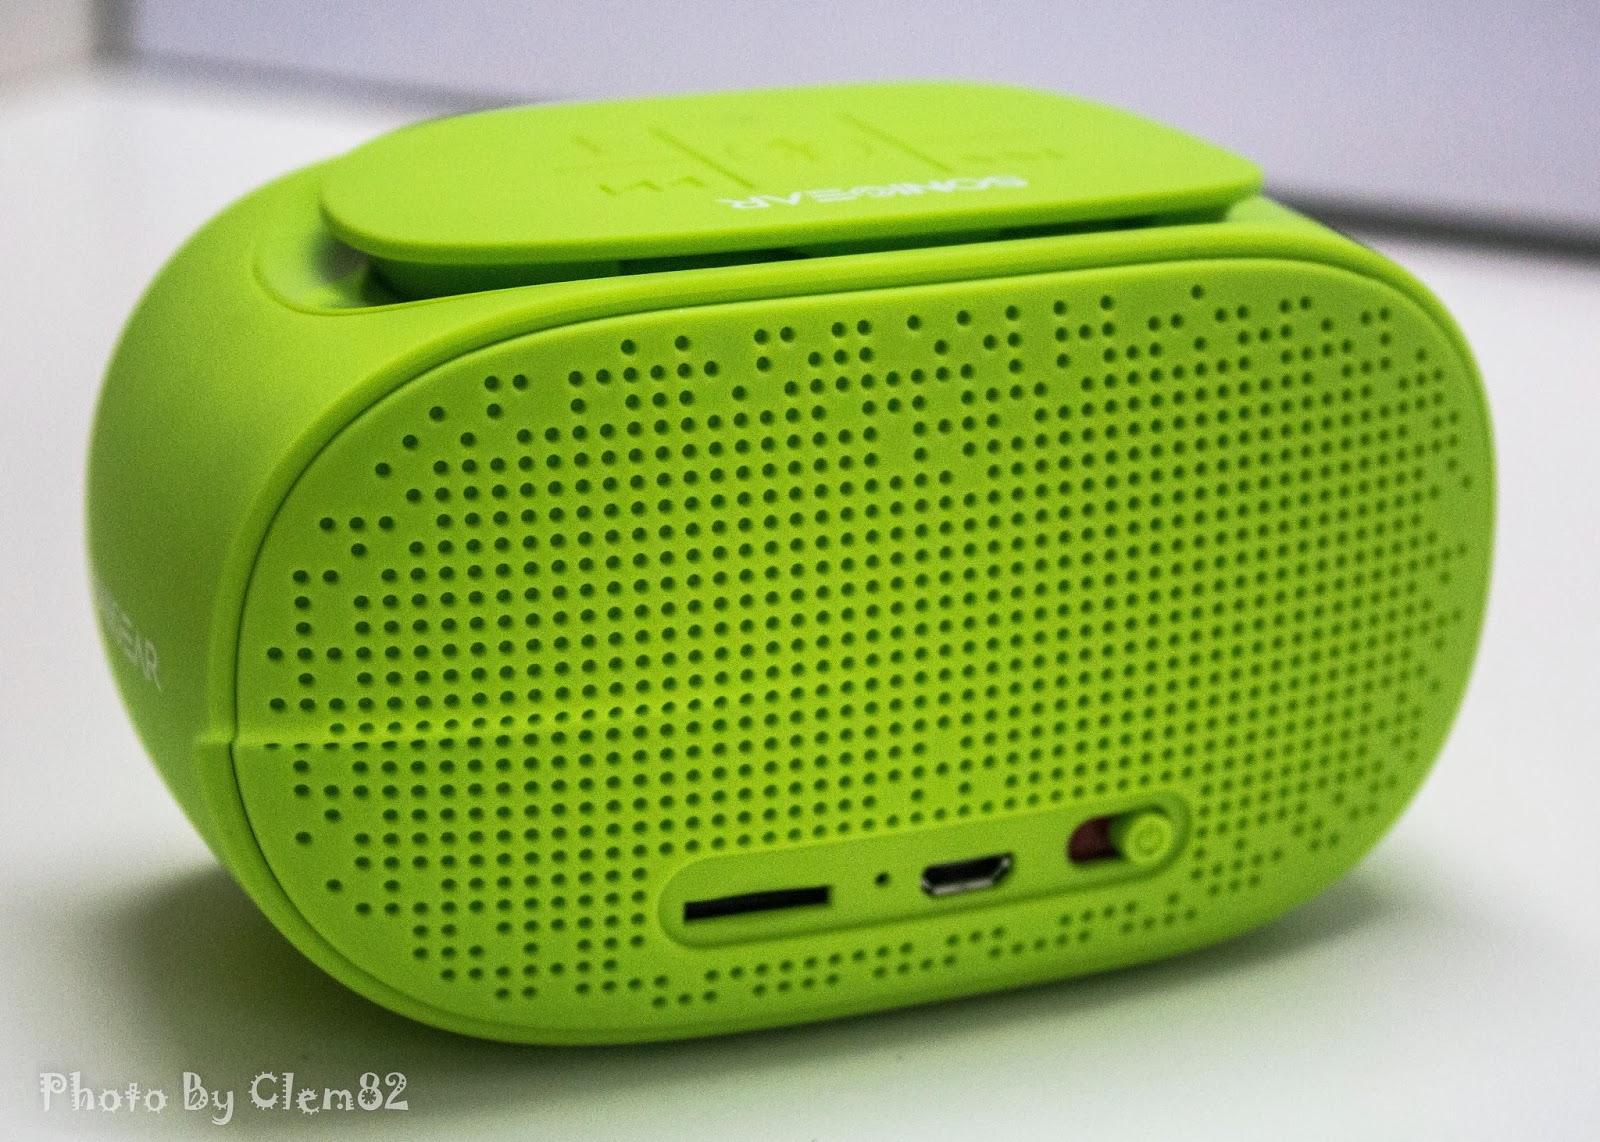 Opening Pandora's Box: SonicGear Pandora Wireless Bluetooth Media Player Series 7